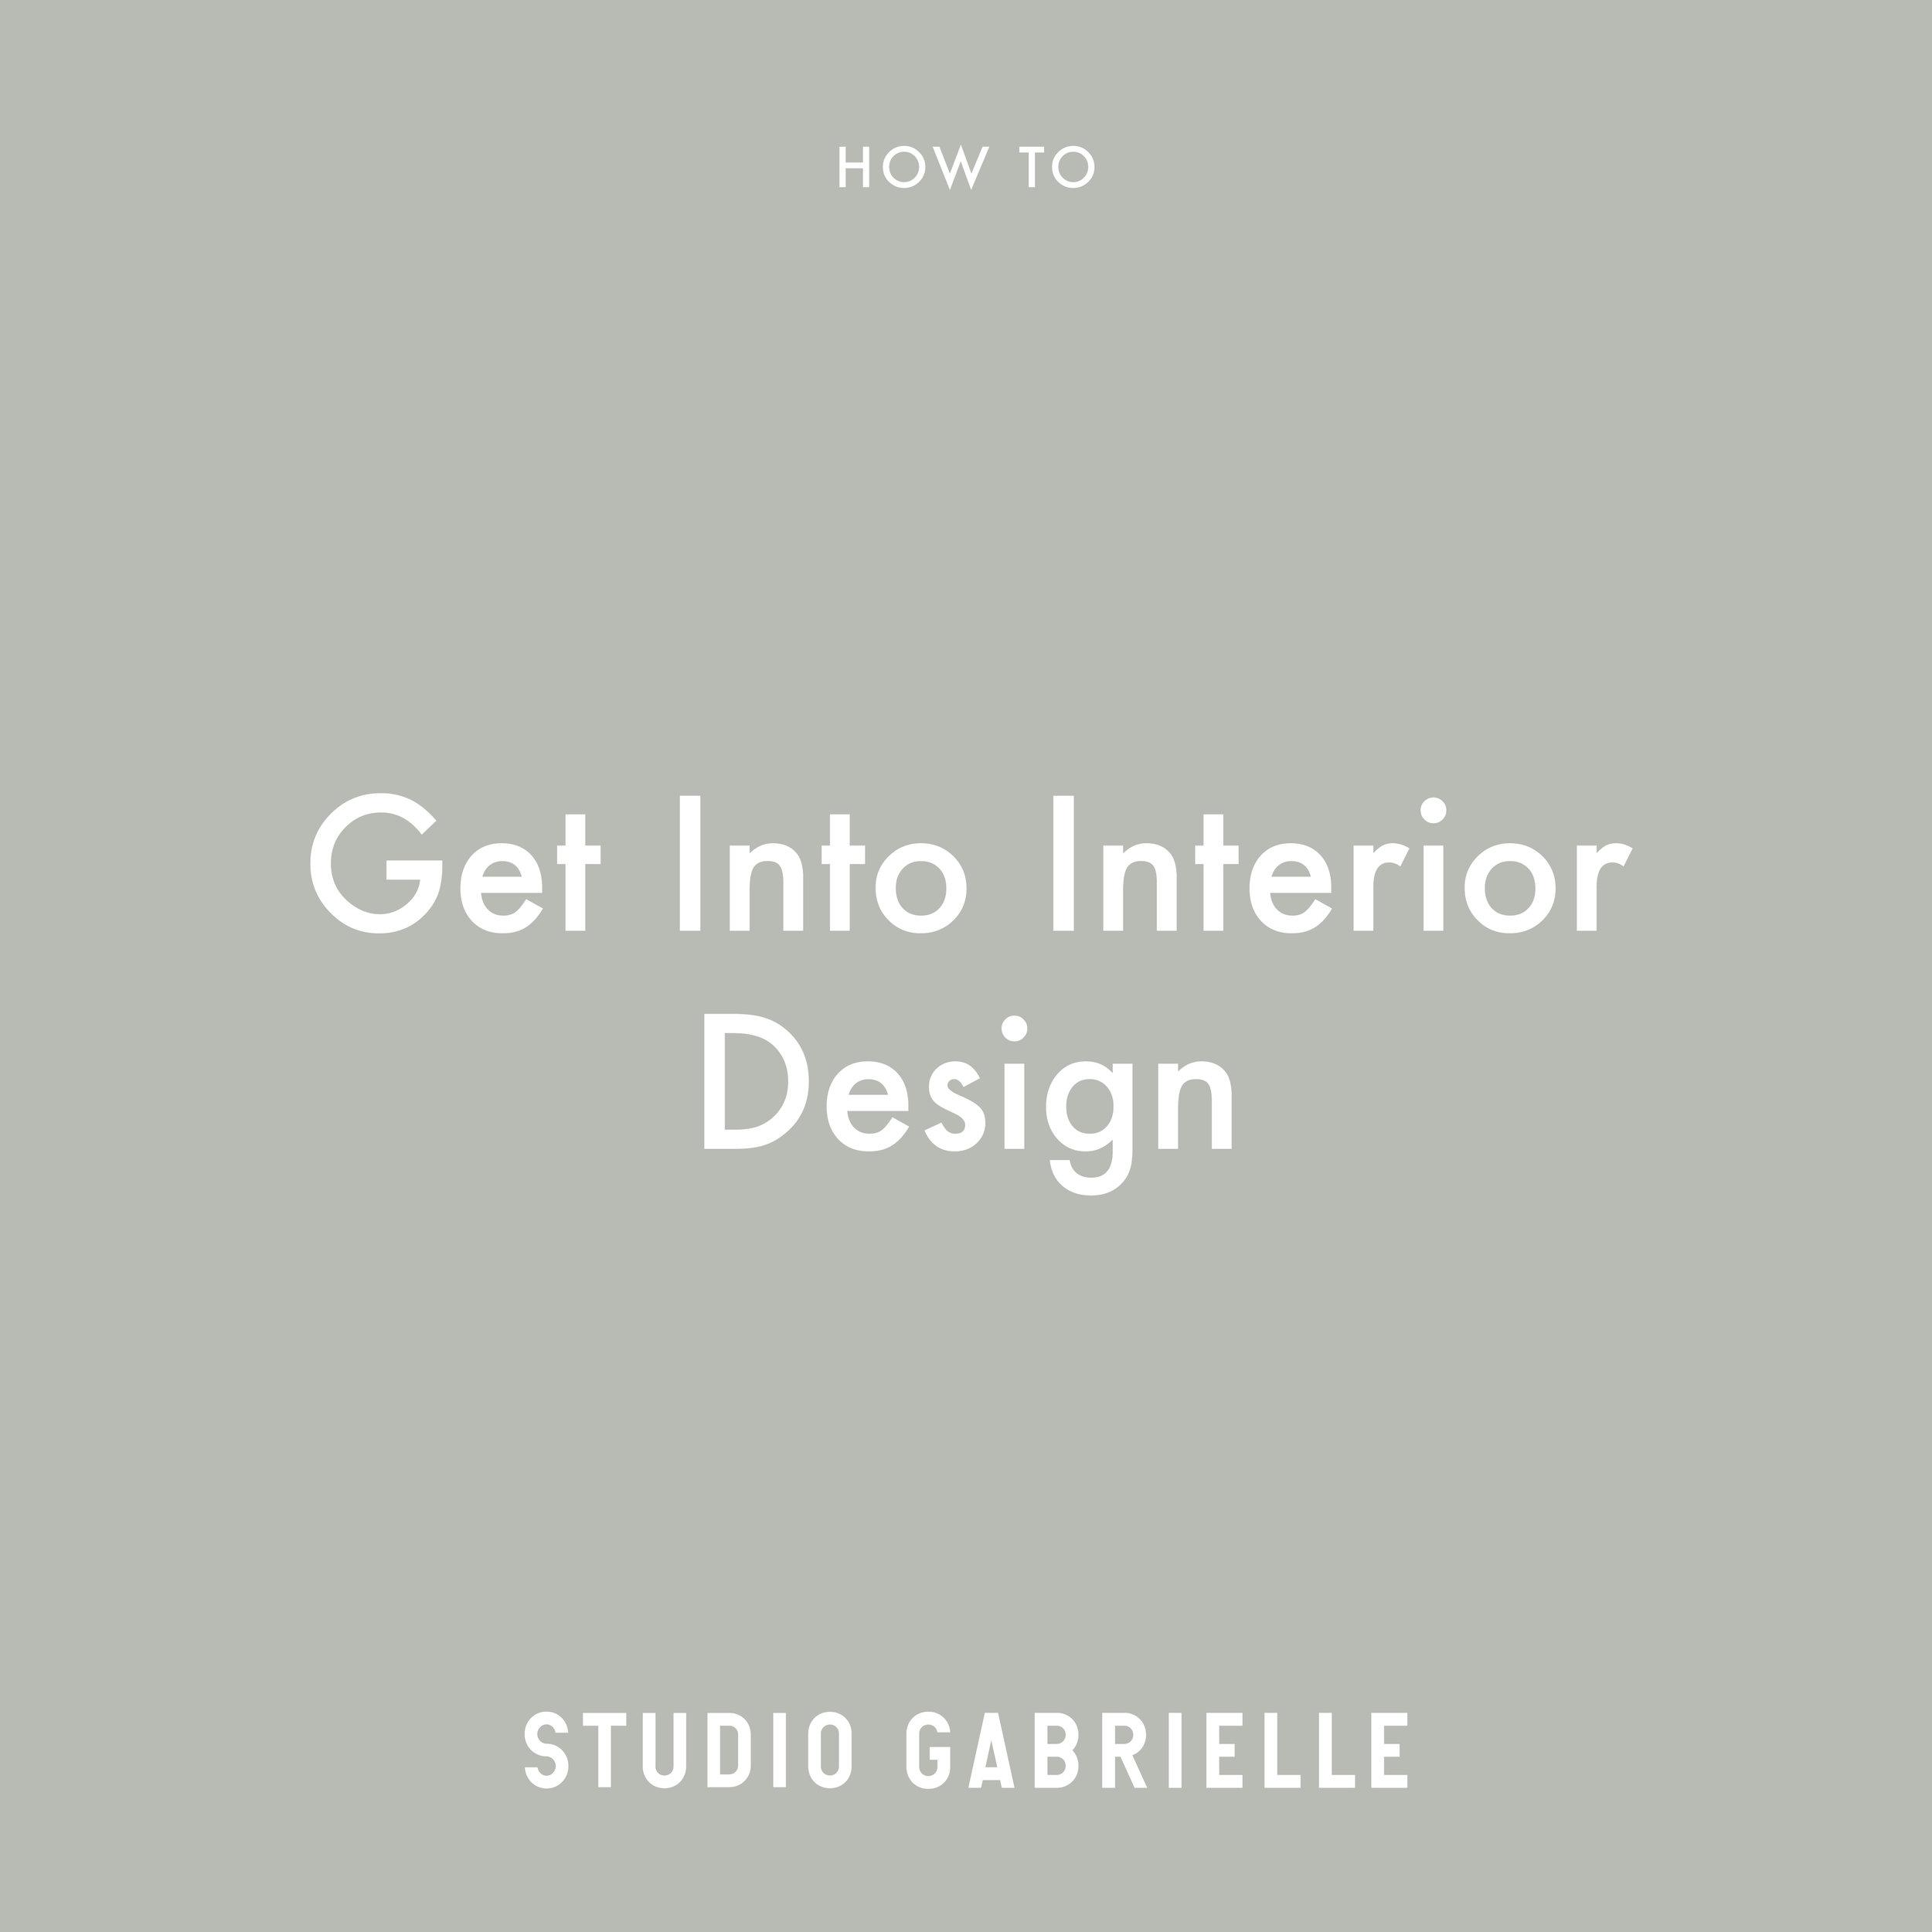 StudioGabrielle-HowTo-Get-Into-Interior-Design-studiogabrielle.co.uk